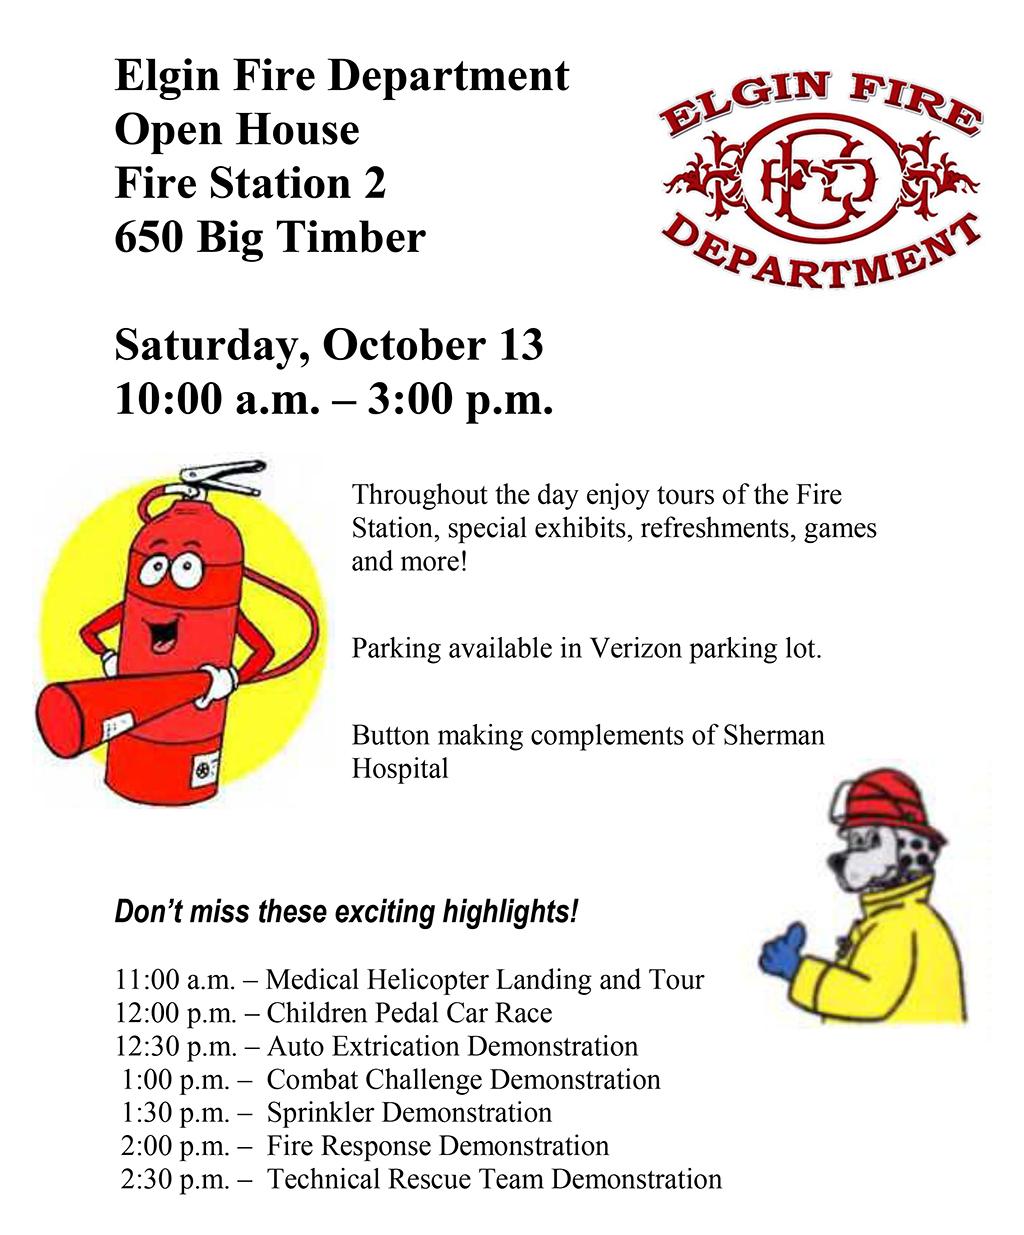 Elgin Fire Department Open House 2012